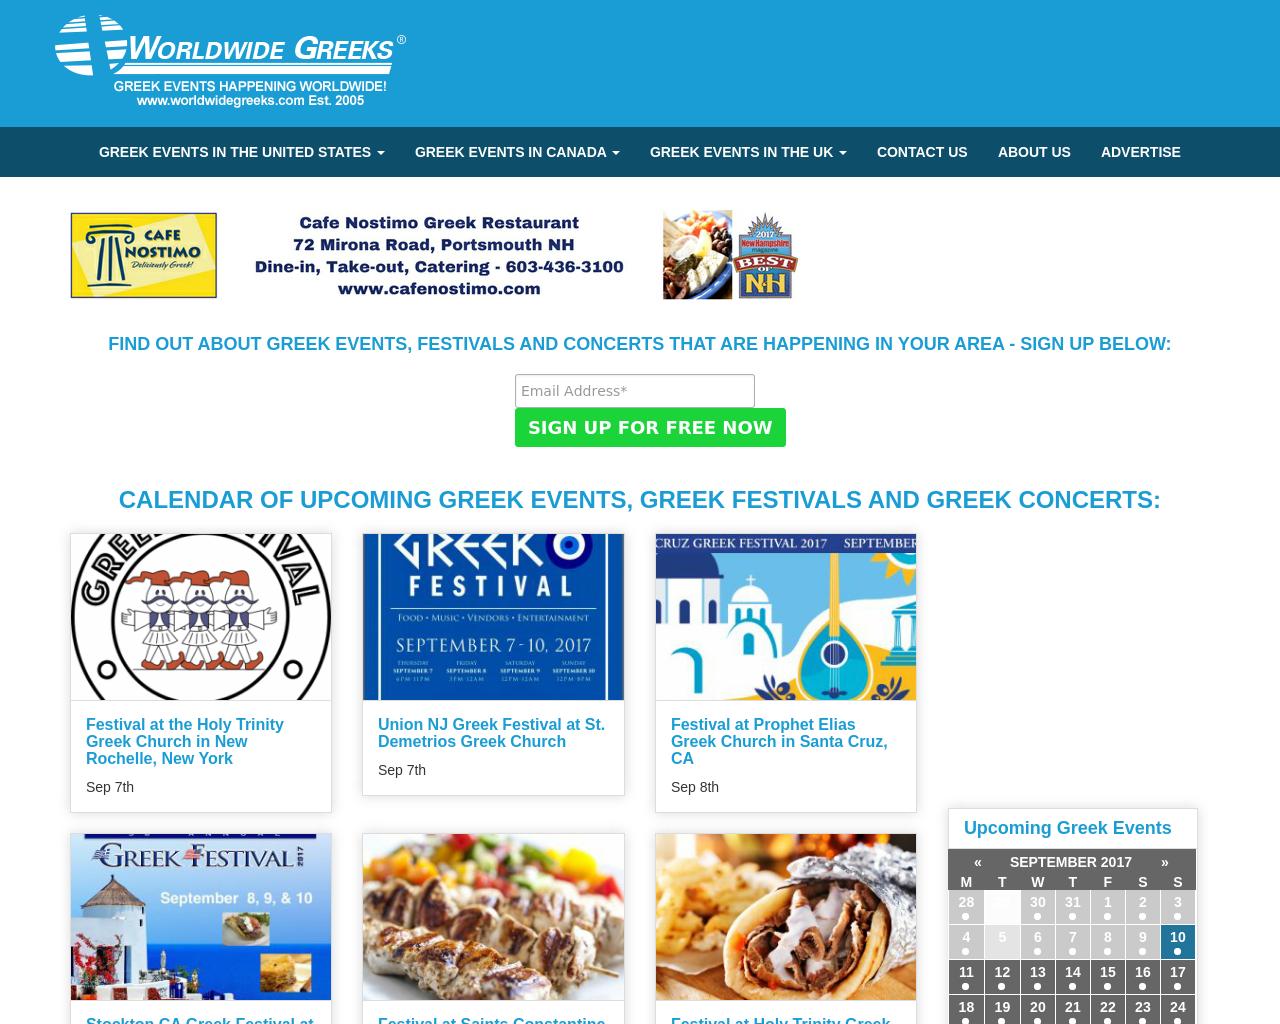 Worldwide-Greeks-Advertising-Reviews-Pricing